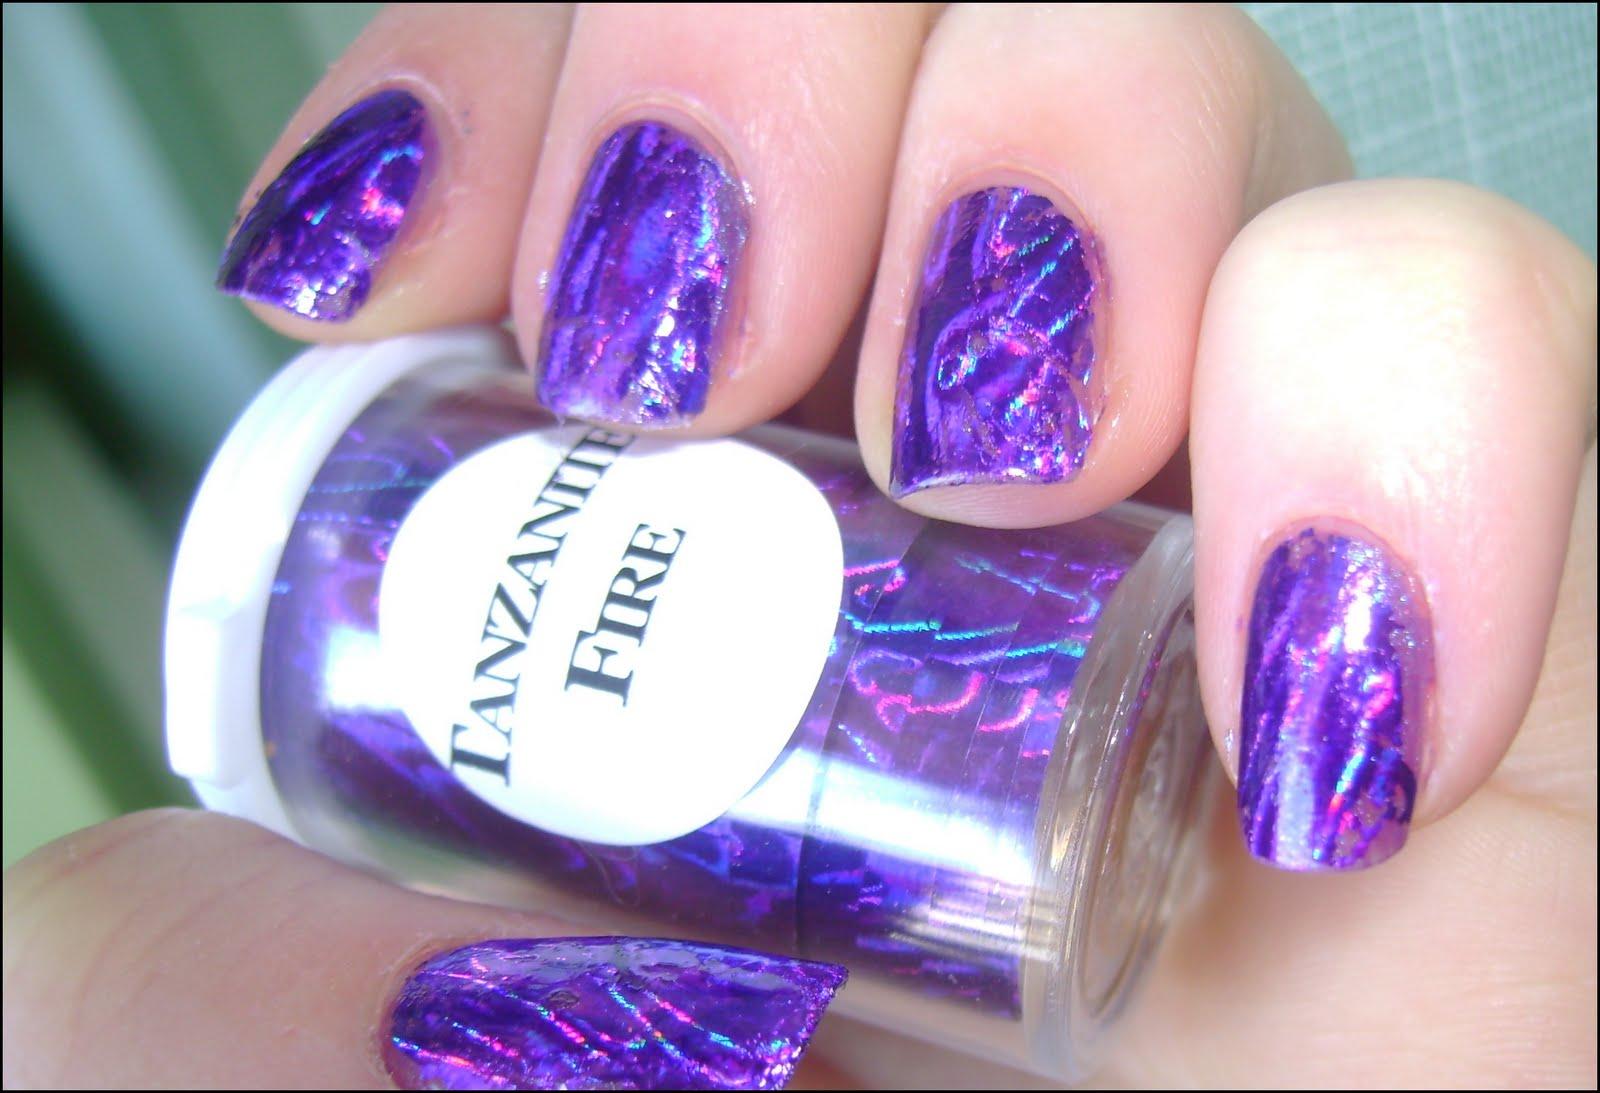 Nail art foil nail arts nail art foil silver starburst spektors nails nail art foil silver starburst nail art foil et stamping dentelle 1 graffiti with nail art transfer prinsesfo Images